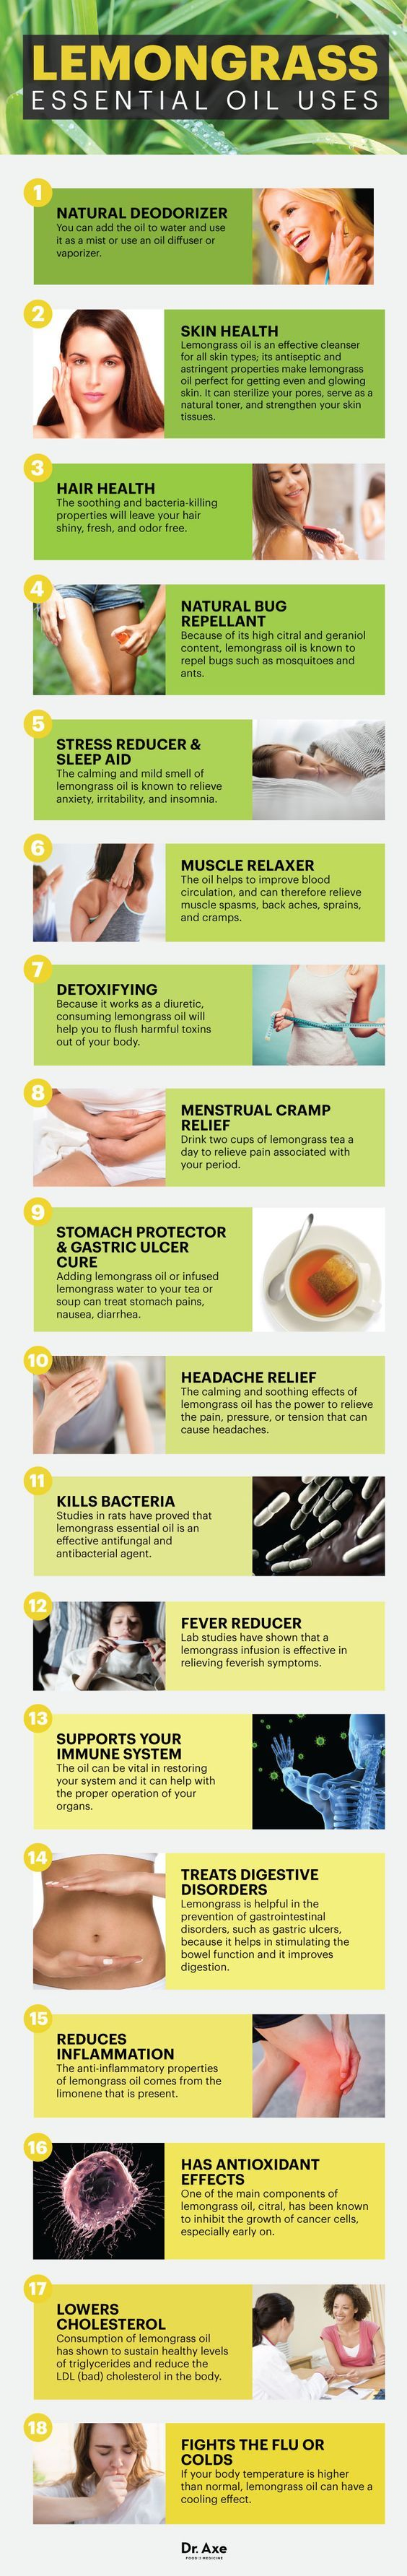 lemon grass benefits Fresh lemongrass tea is easy to make and oh-so-addictive.